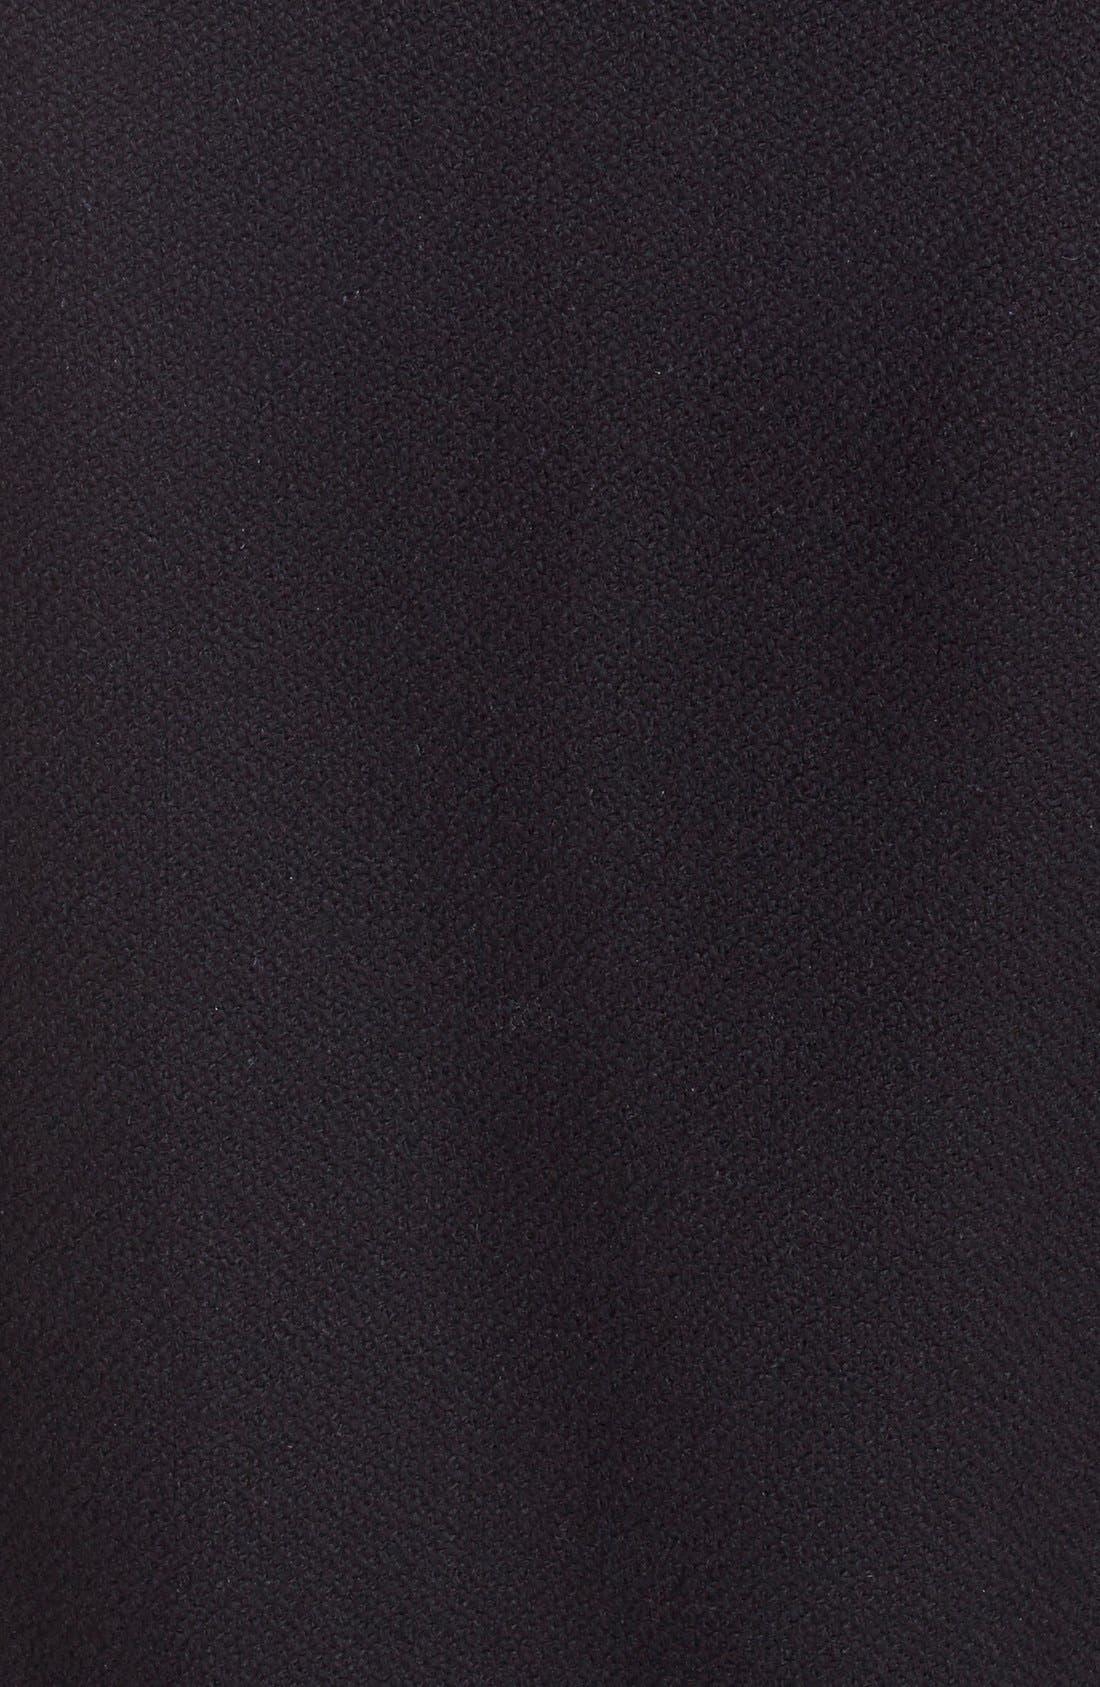 Alternate Image 3  - Saint Laurent 'Teddy' White Leather Trim Bomber Jacket